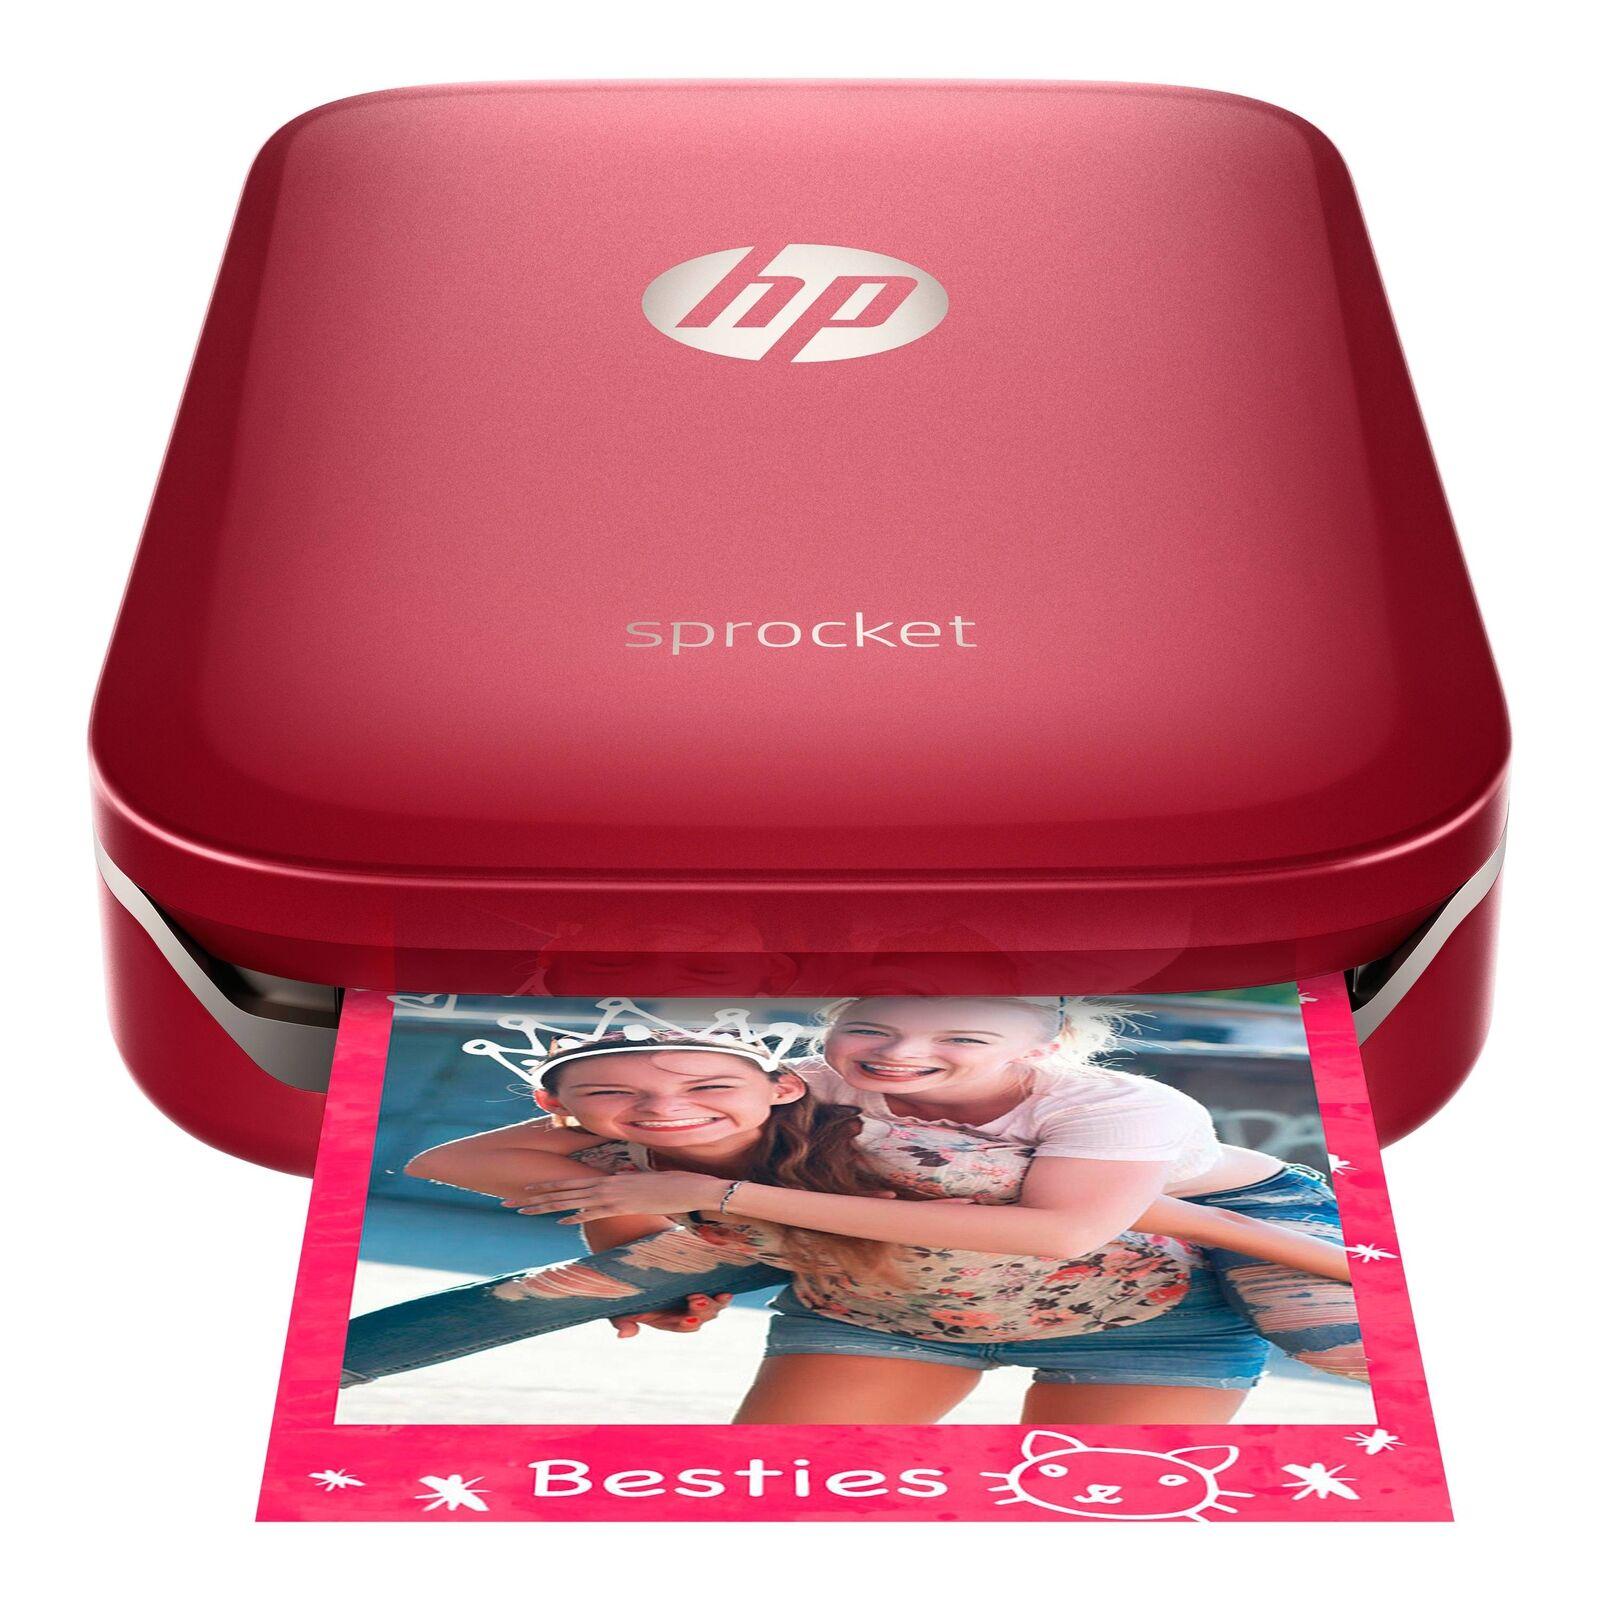 $109.95 - *BRAND NEW* HP - Sprocket 100 Photo Printer Smartphone Printer - Red